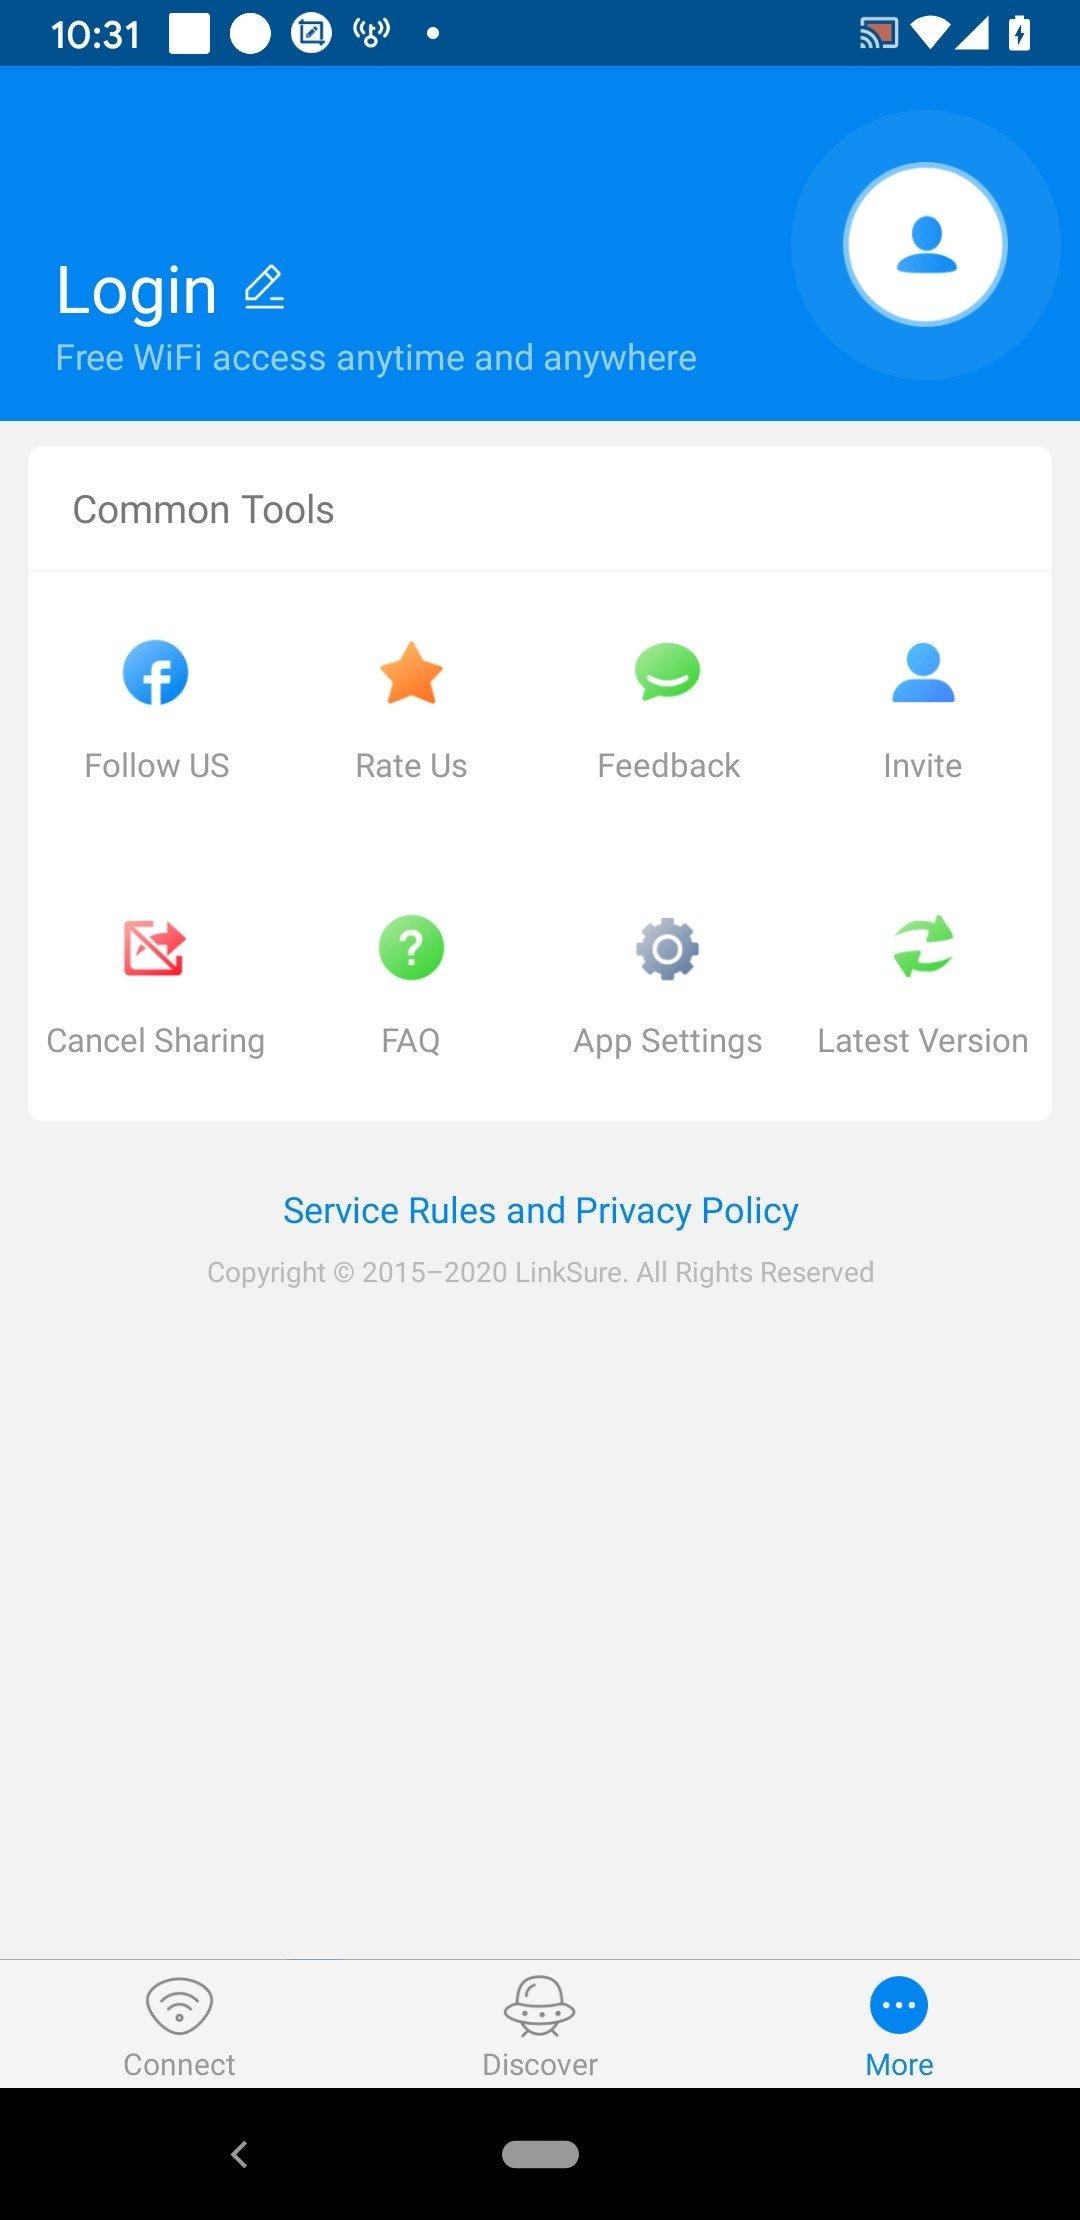 Download master wifi key apk | WiFi Master Key APK Download